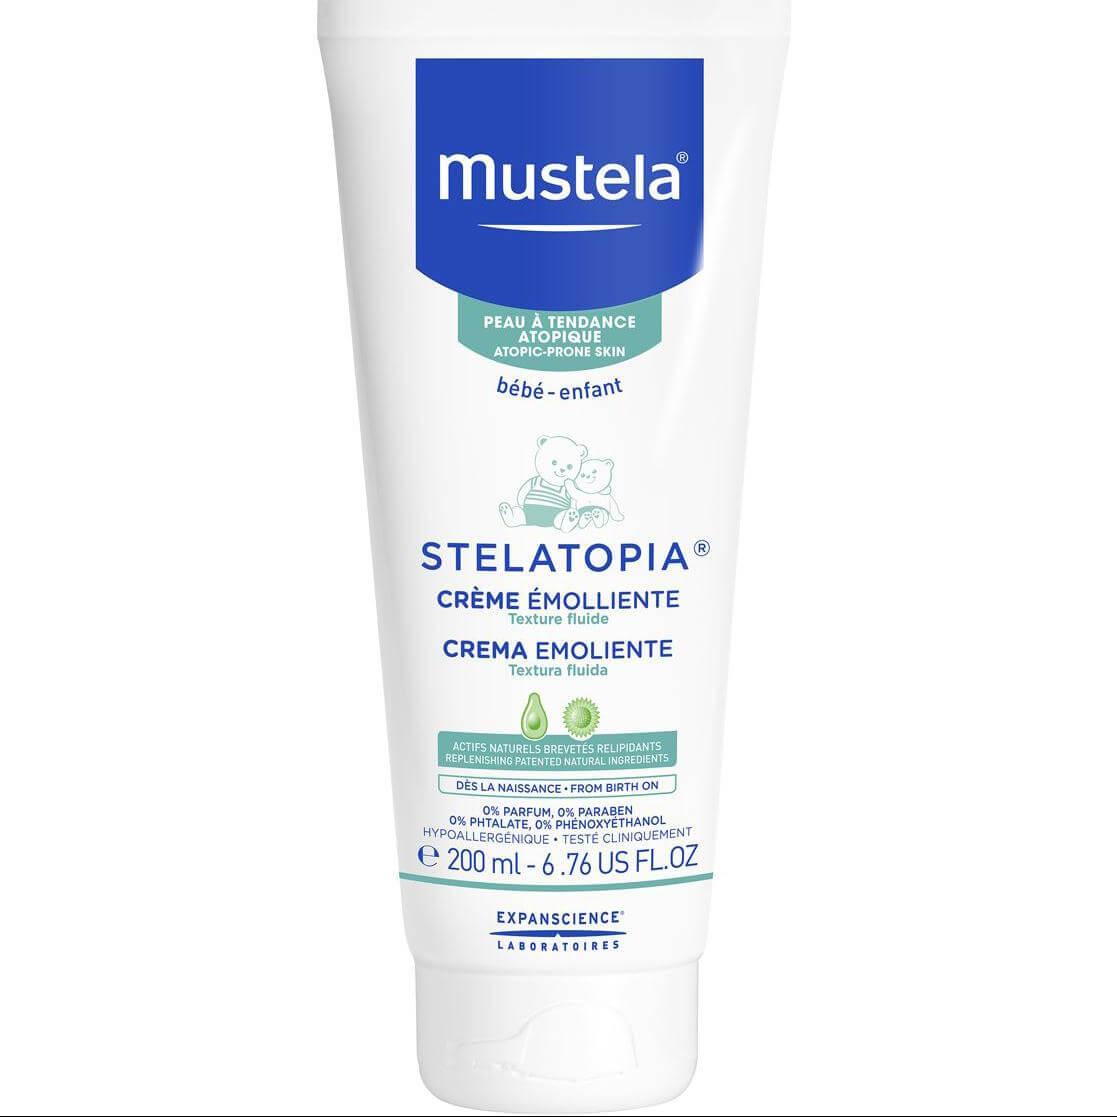 Mustela Stelatopia Creme EmollienteΜαλακτικήΚρέμαγια Βρεφική Ατοπική ΔερματίτιδαΠλούσιας Υφής 200ml